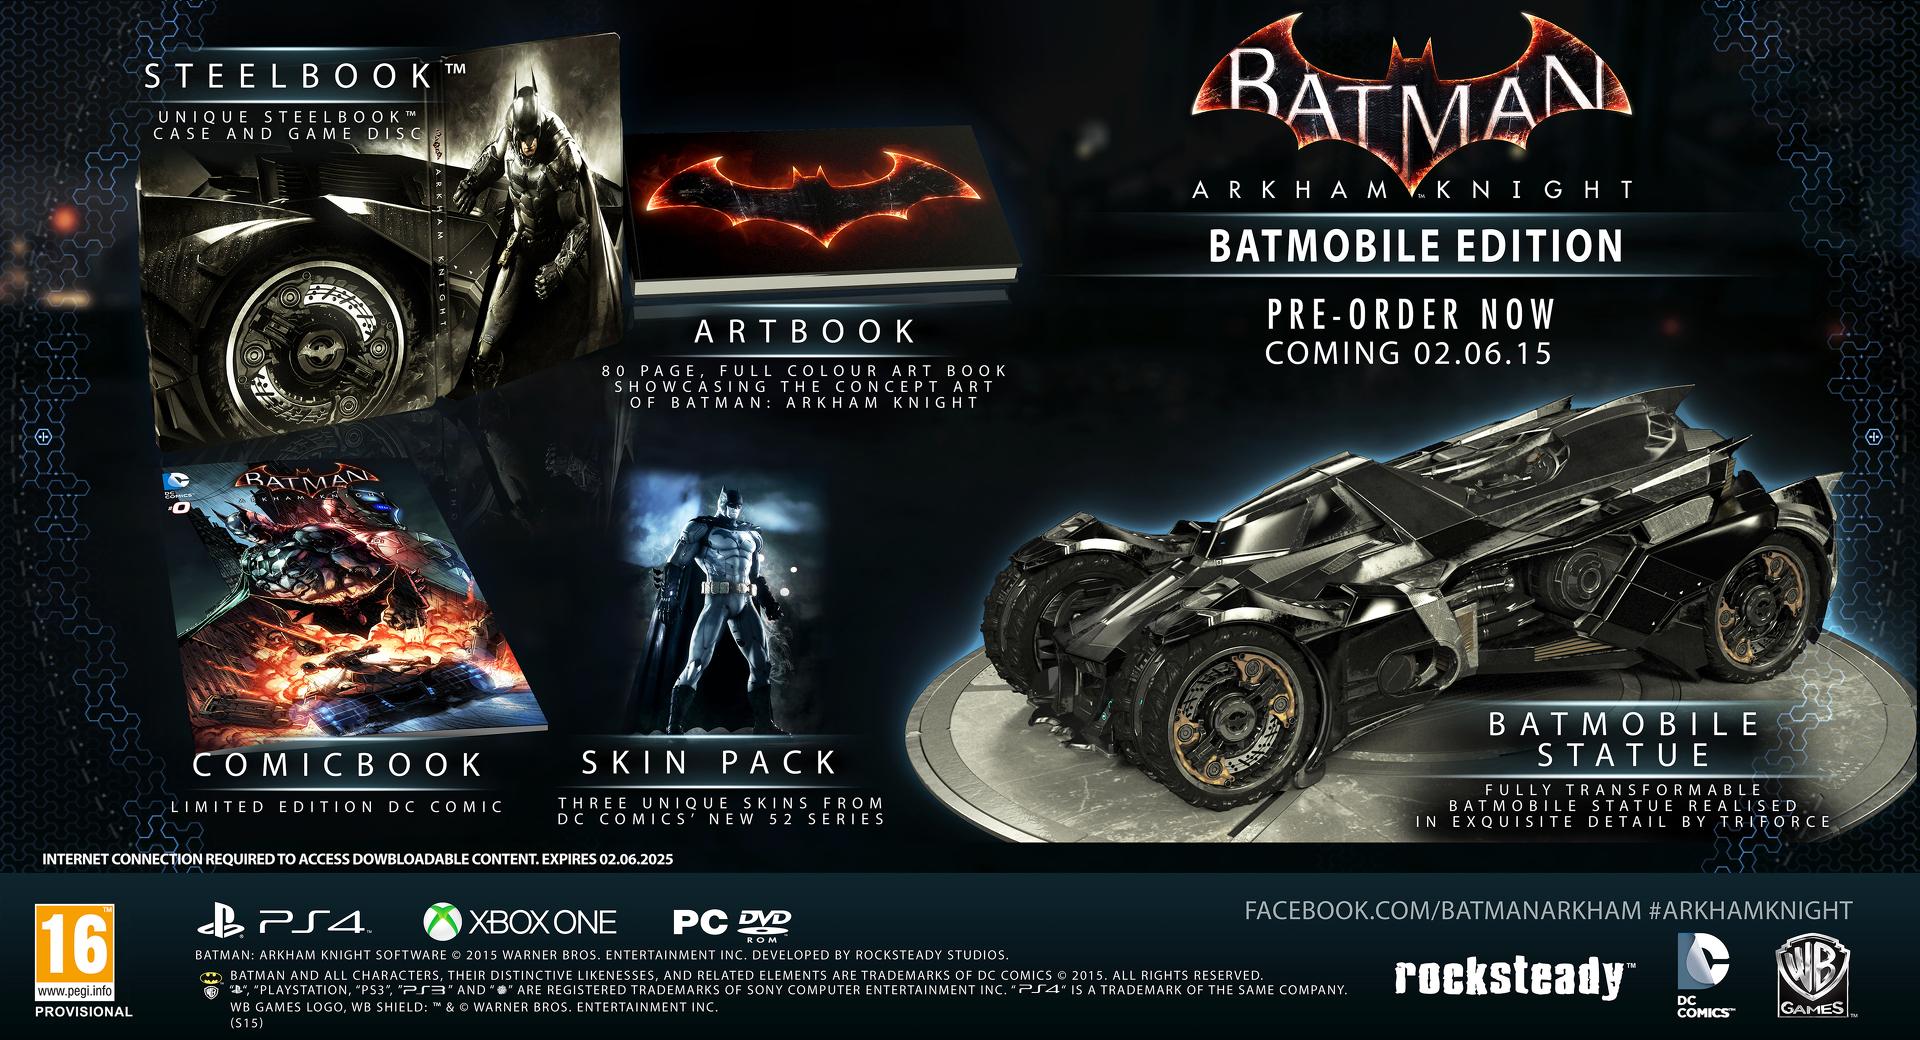 Špatná kvalita vyústila ve zrušení Batmobile edice Batman: Arkham Knight 100311